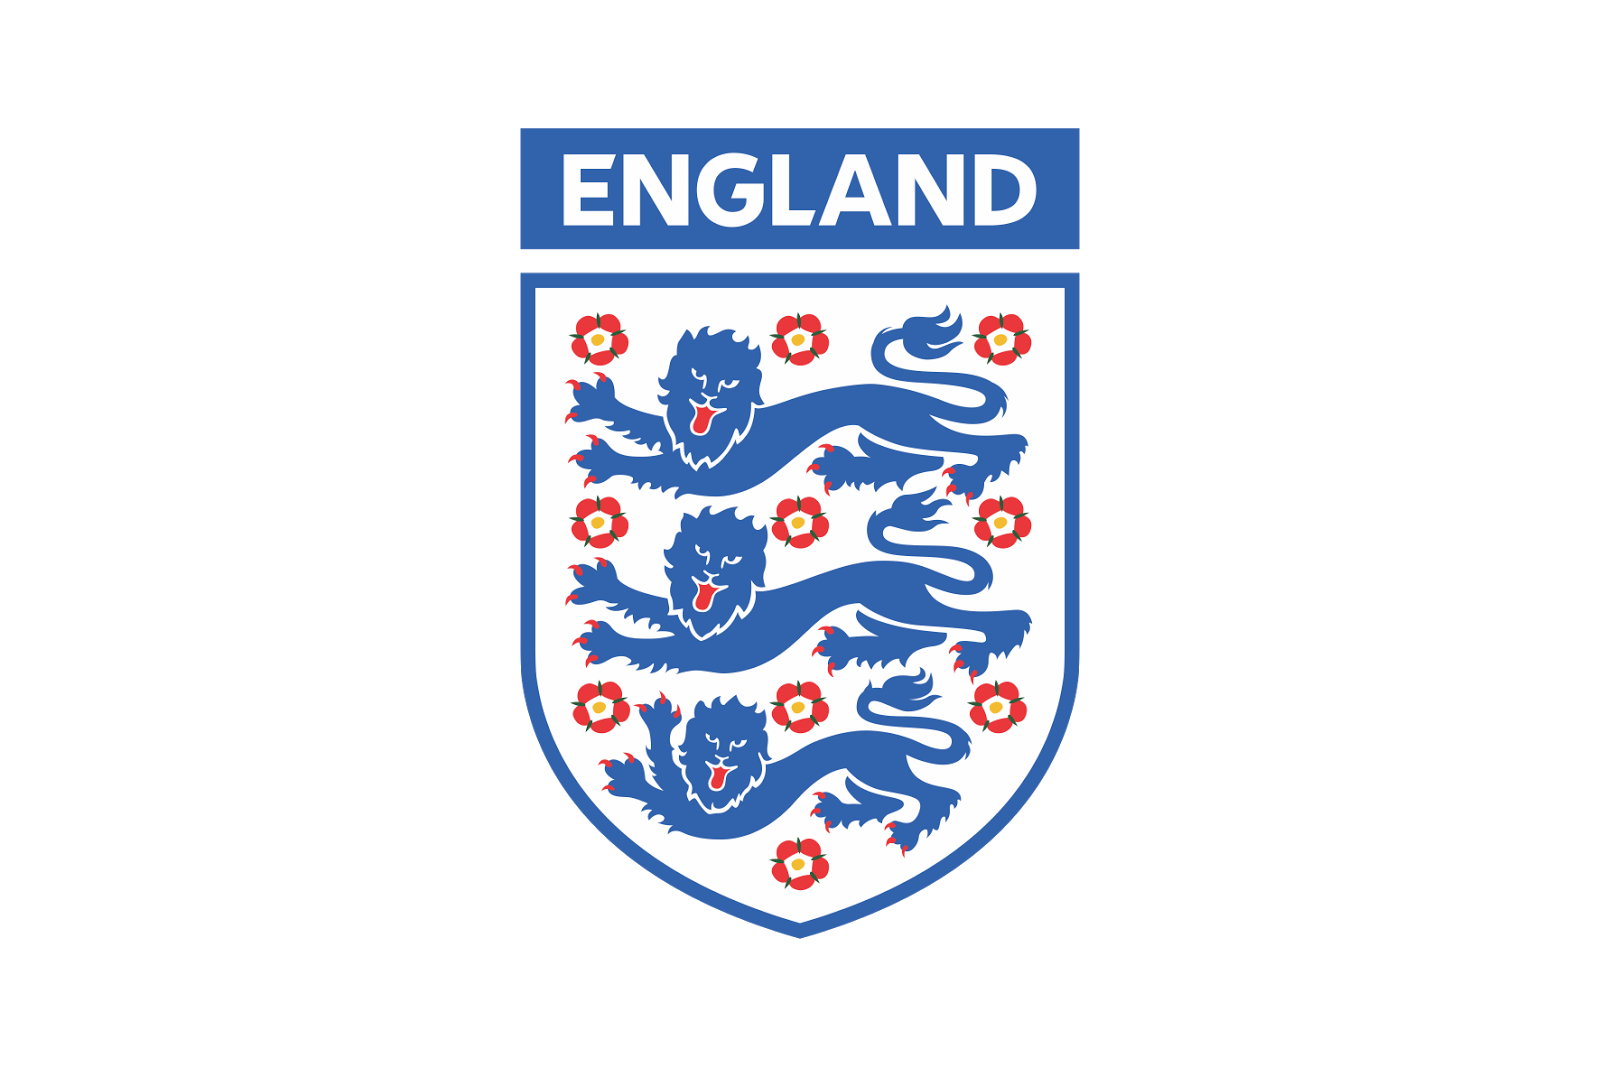 Logo+England_Football_Association.png 1,600×1,067 pixels